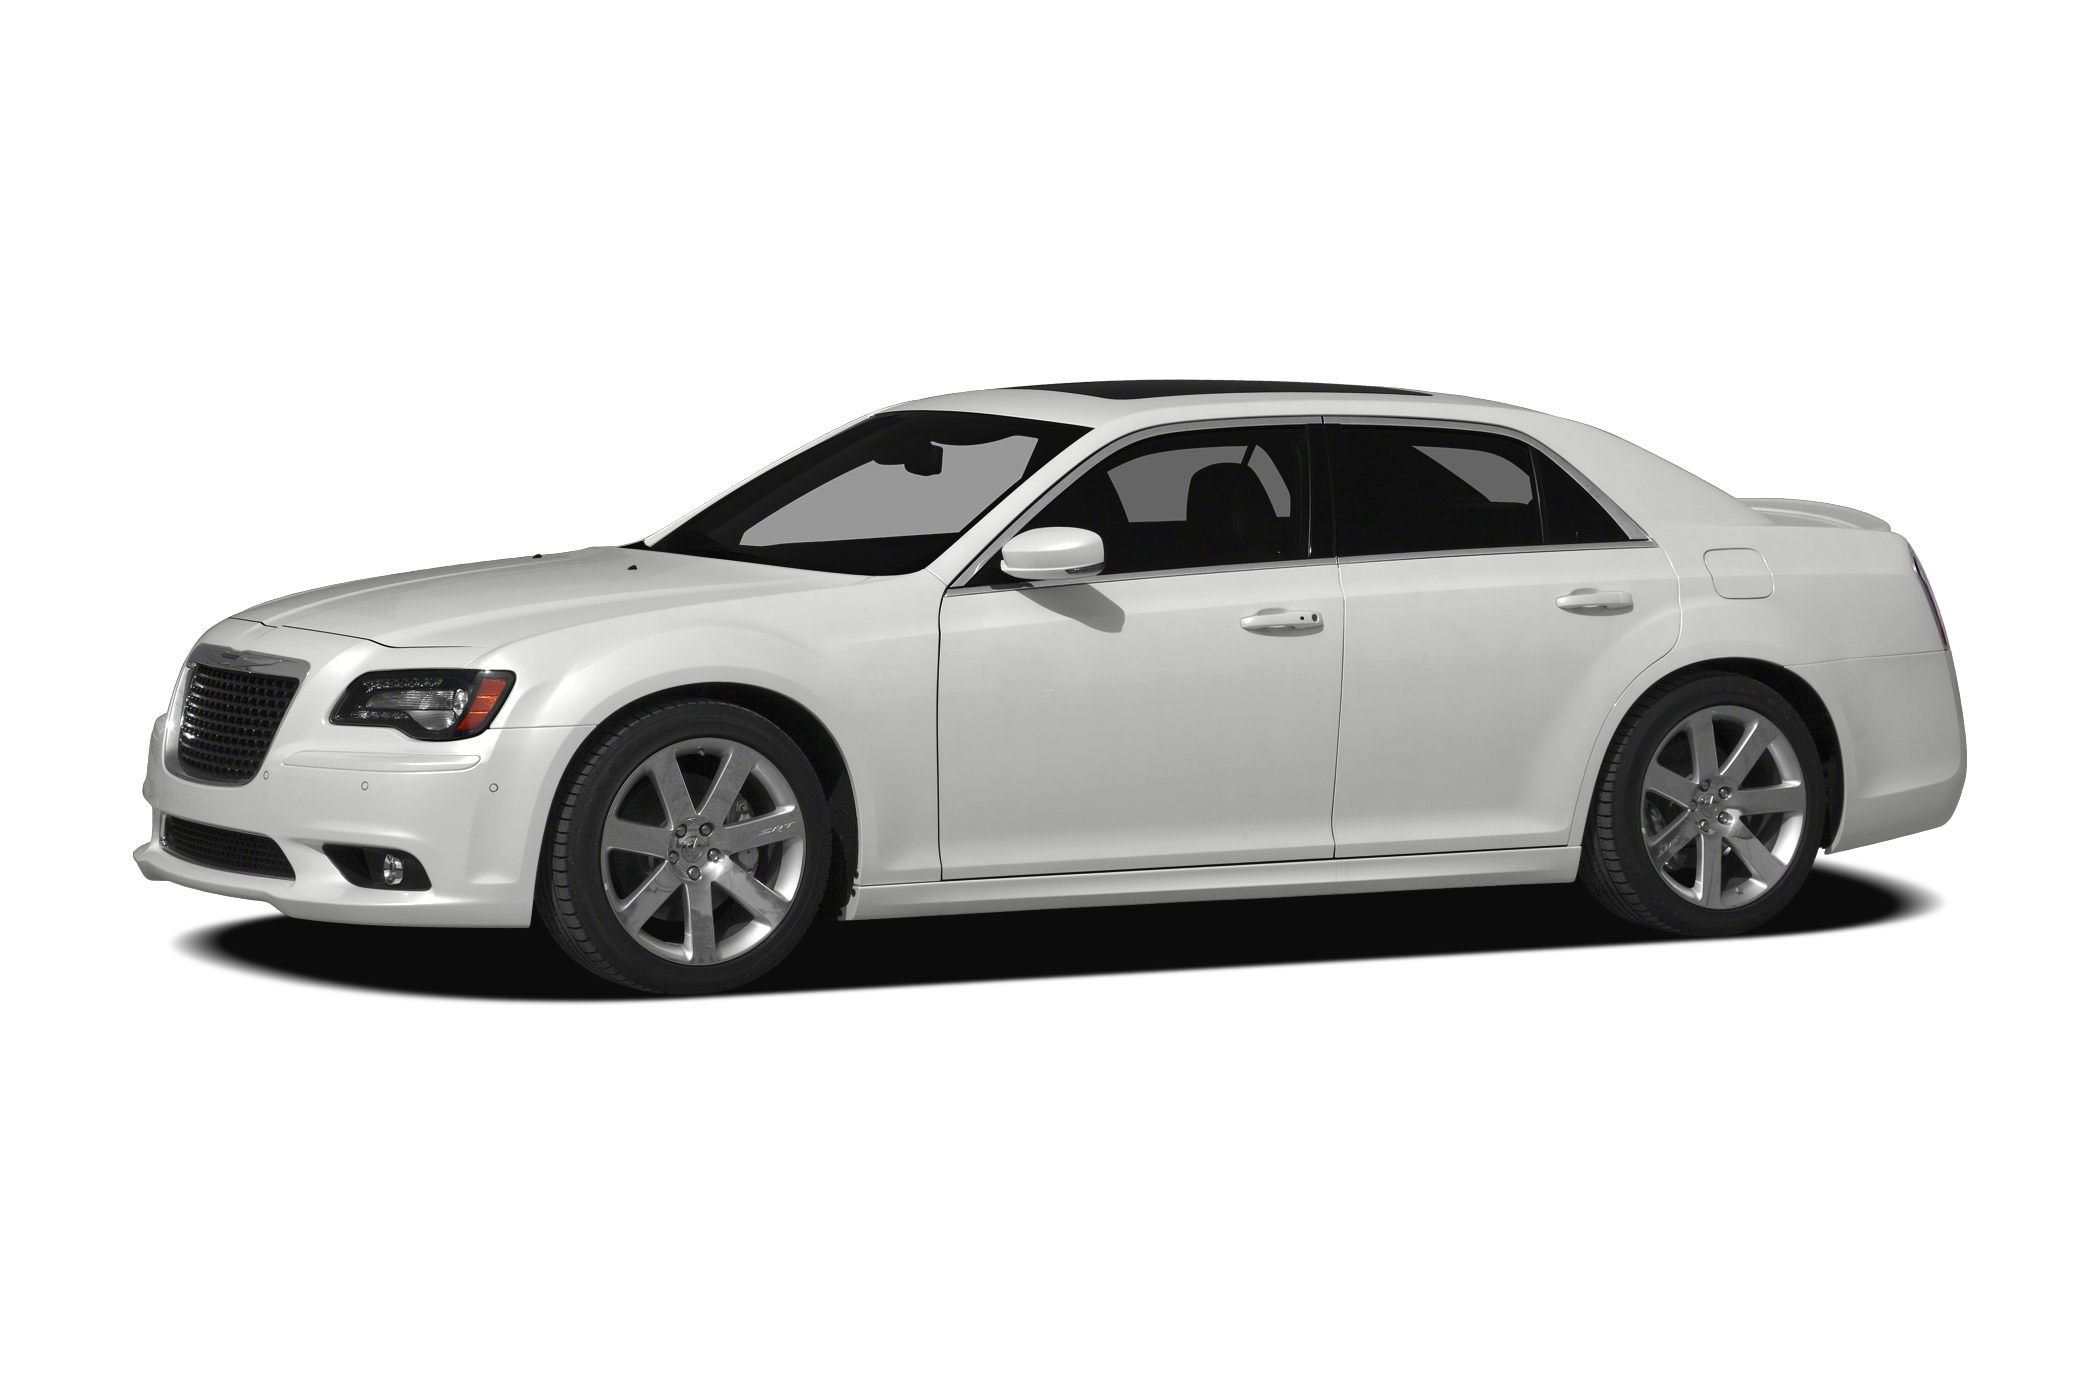 2012 Chrysler 300 SRT8 4dr Rear wheel Drive Sedan Specs and Prices